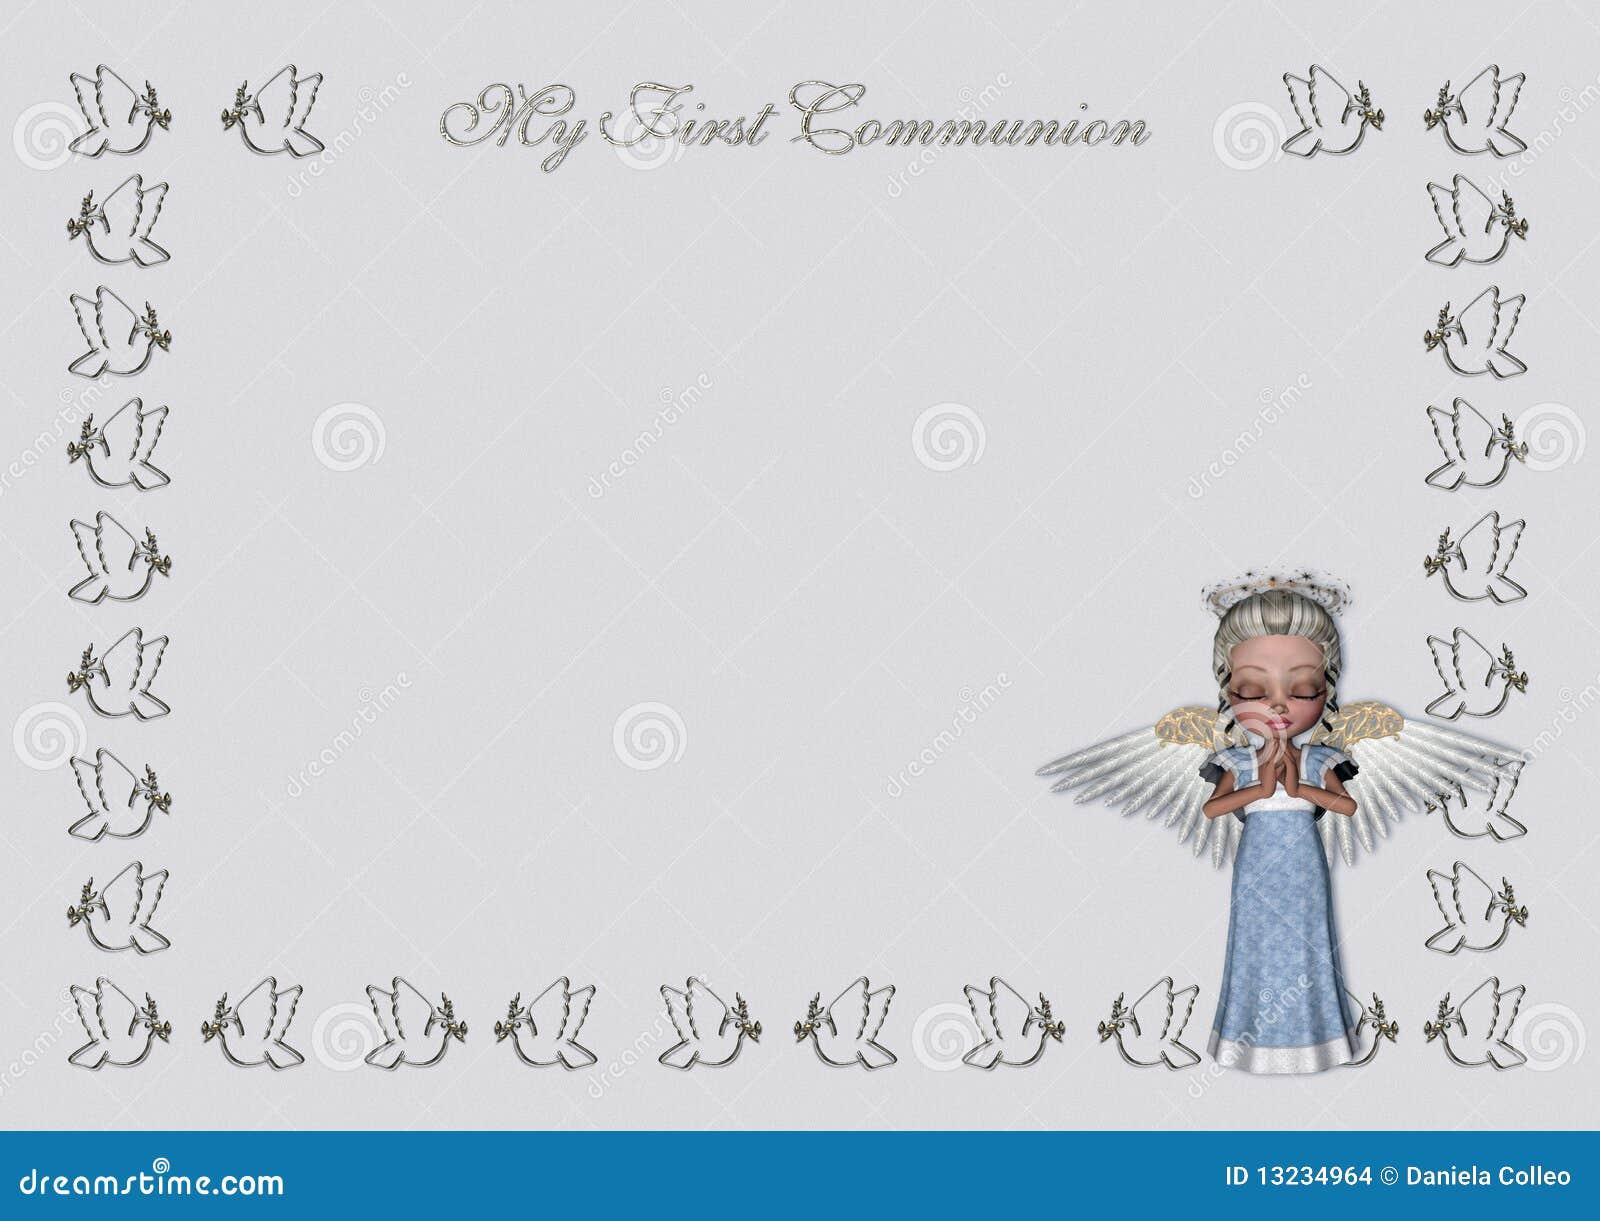 Elegant First Communion Invitations for adorable invitations example